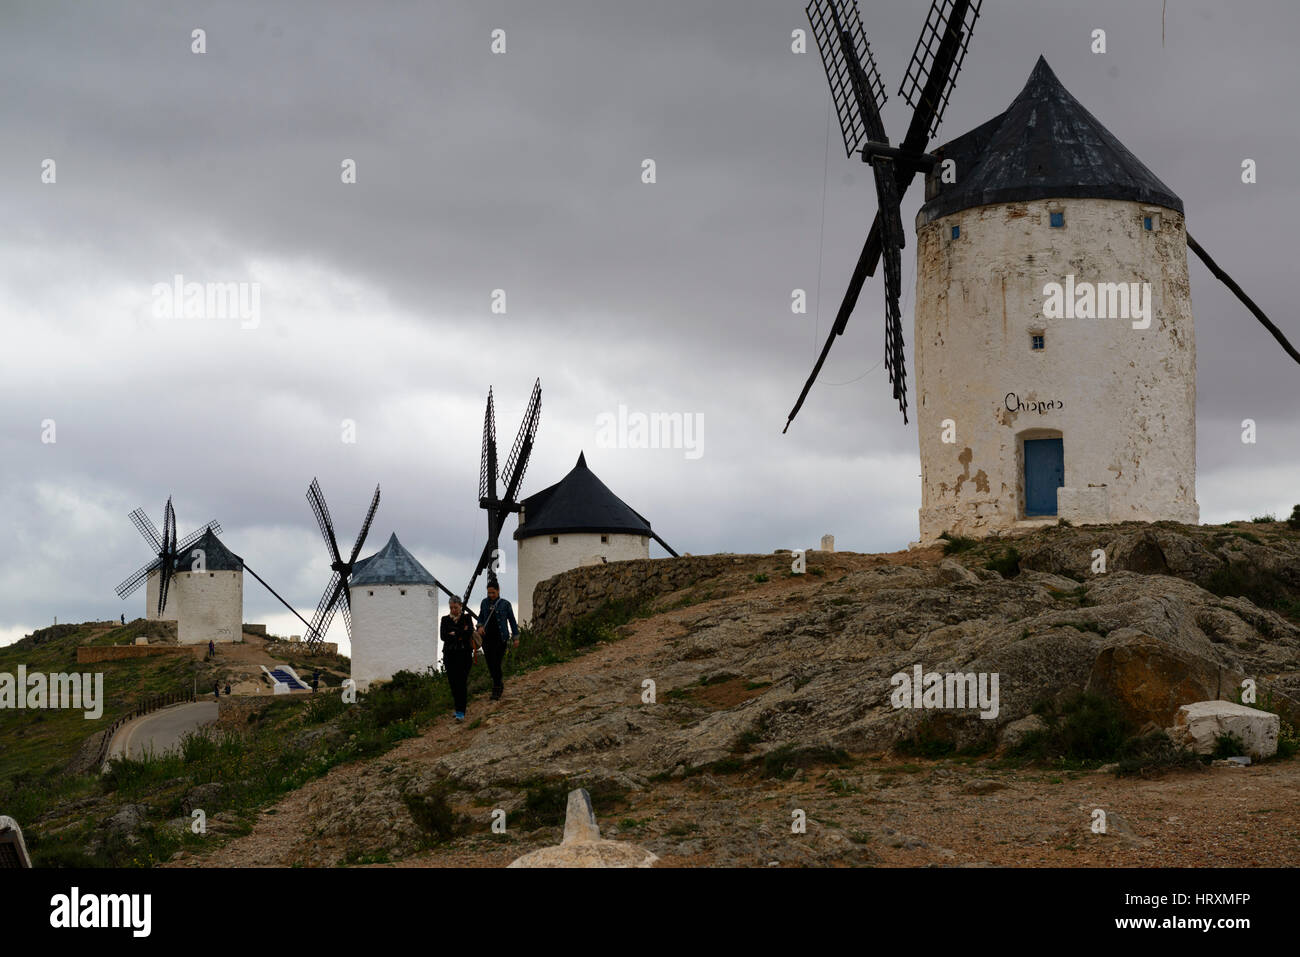 The famous mills of Consuegra, province of Toledo, Castile-La Mancha, Spain - Stock Image